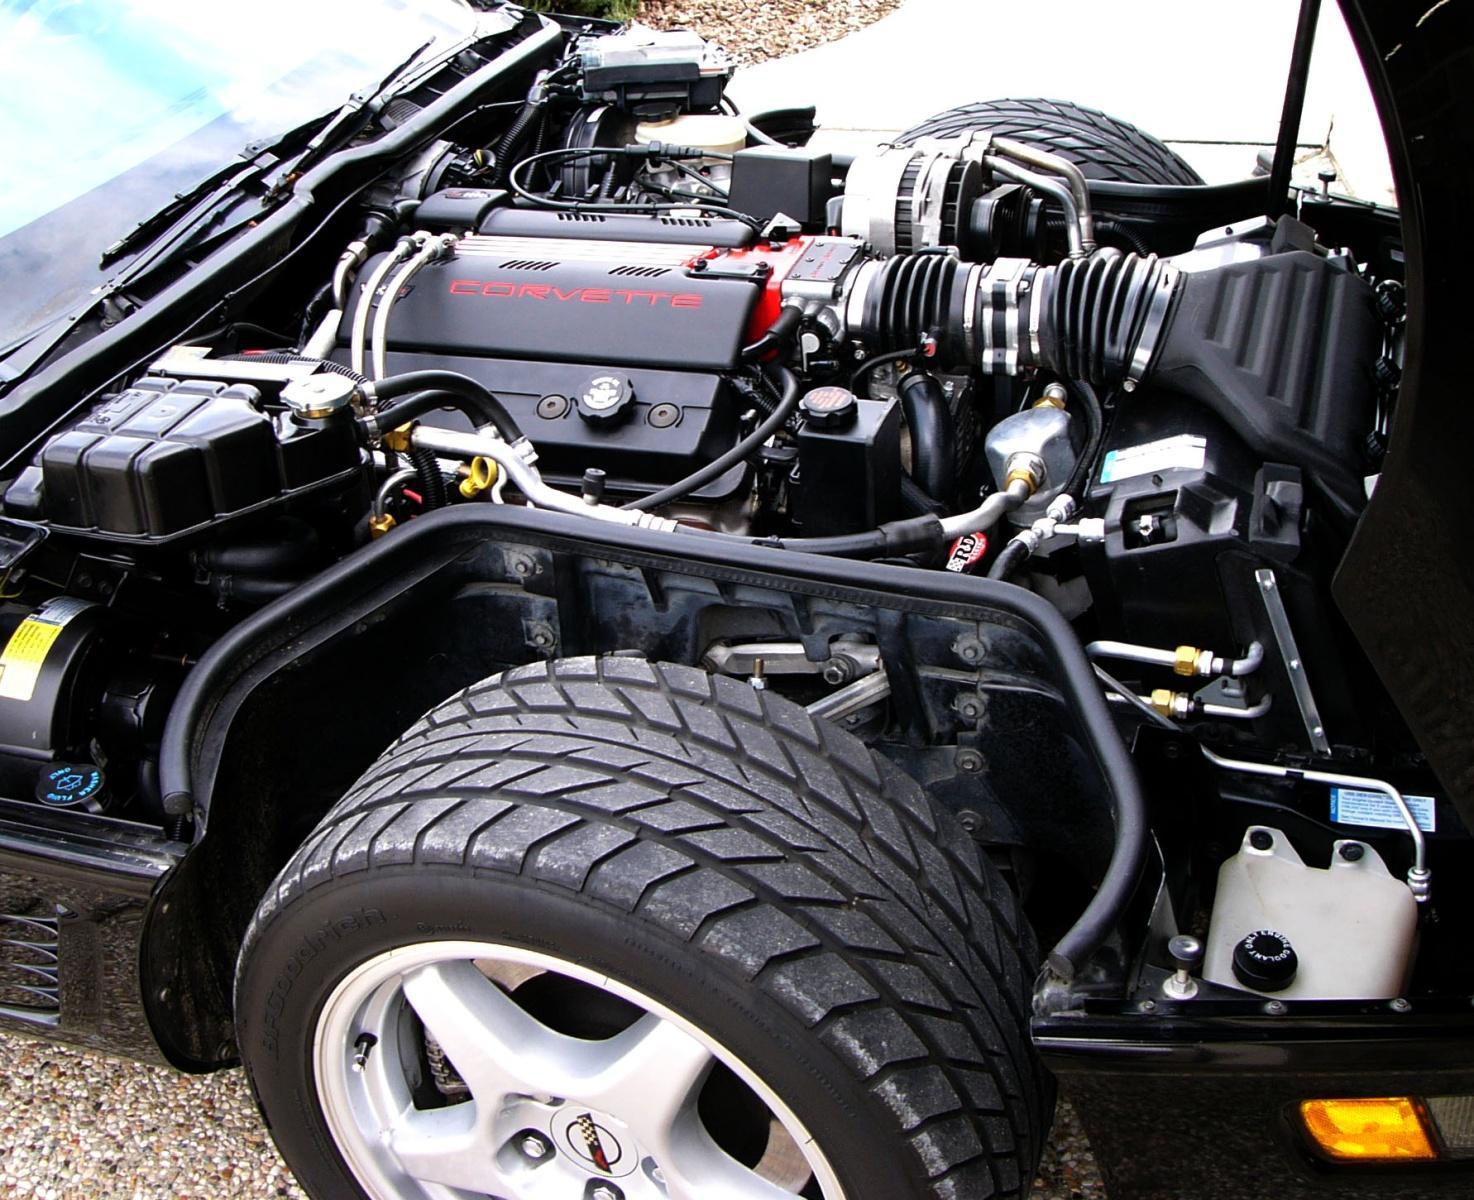 hight resolution of 96 corvette lt1 engine diagram wiring diagram load 96 corvette lt1 engine diagram 1996 corvette lt1 engine diagram